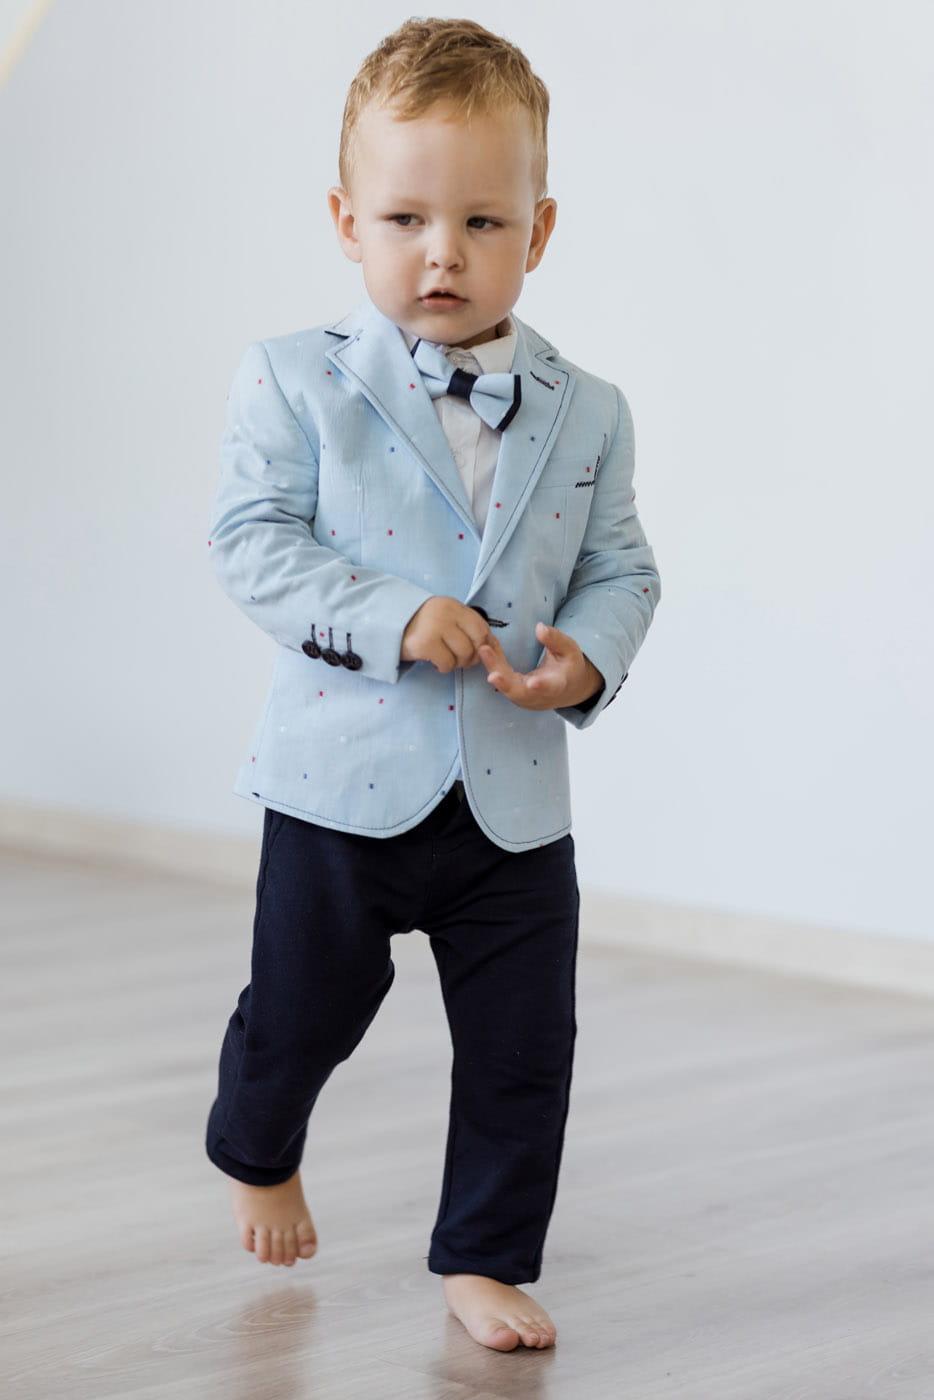 48a187d1c6194 LaFerio Sky garnitur dla chłopca niebieski - Garniturki - Kacper i ...